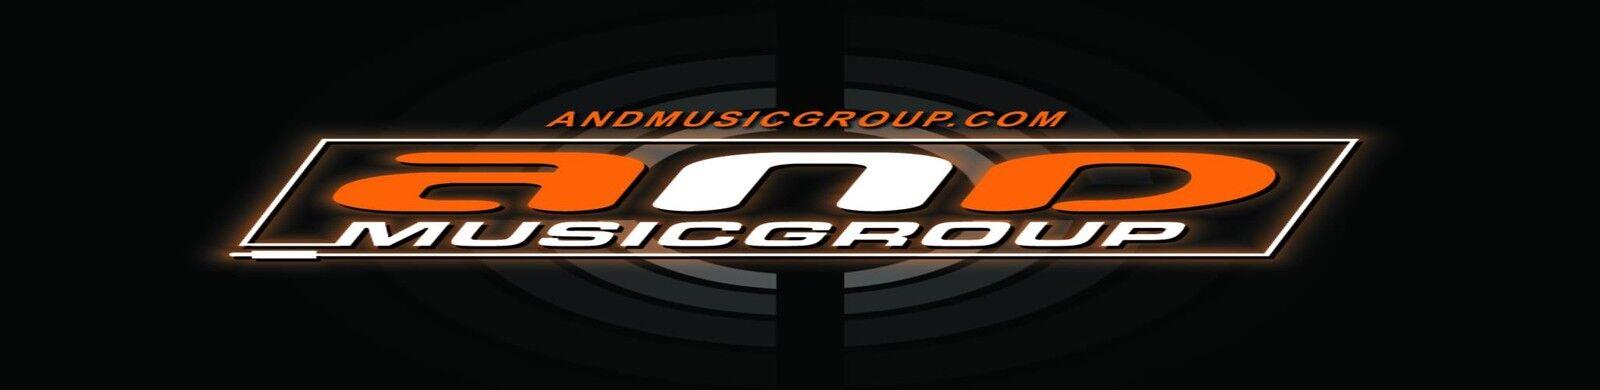 andmusicgroup415